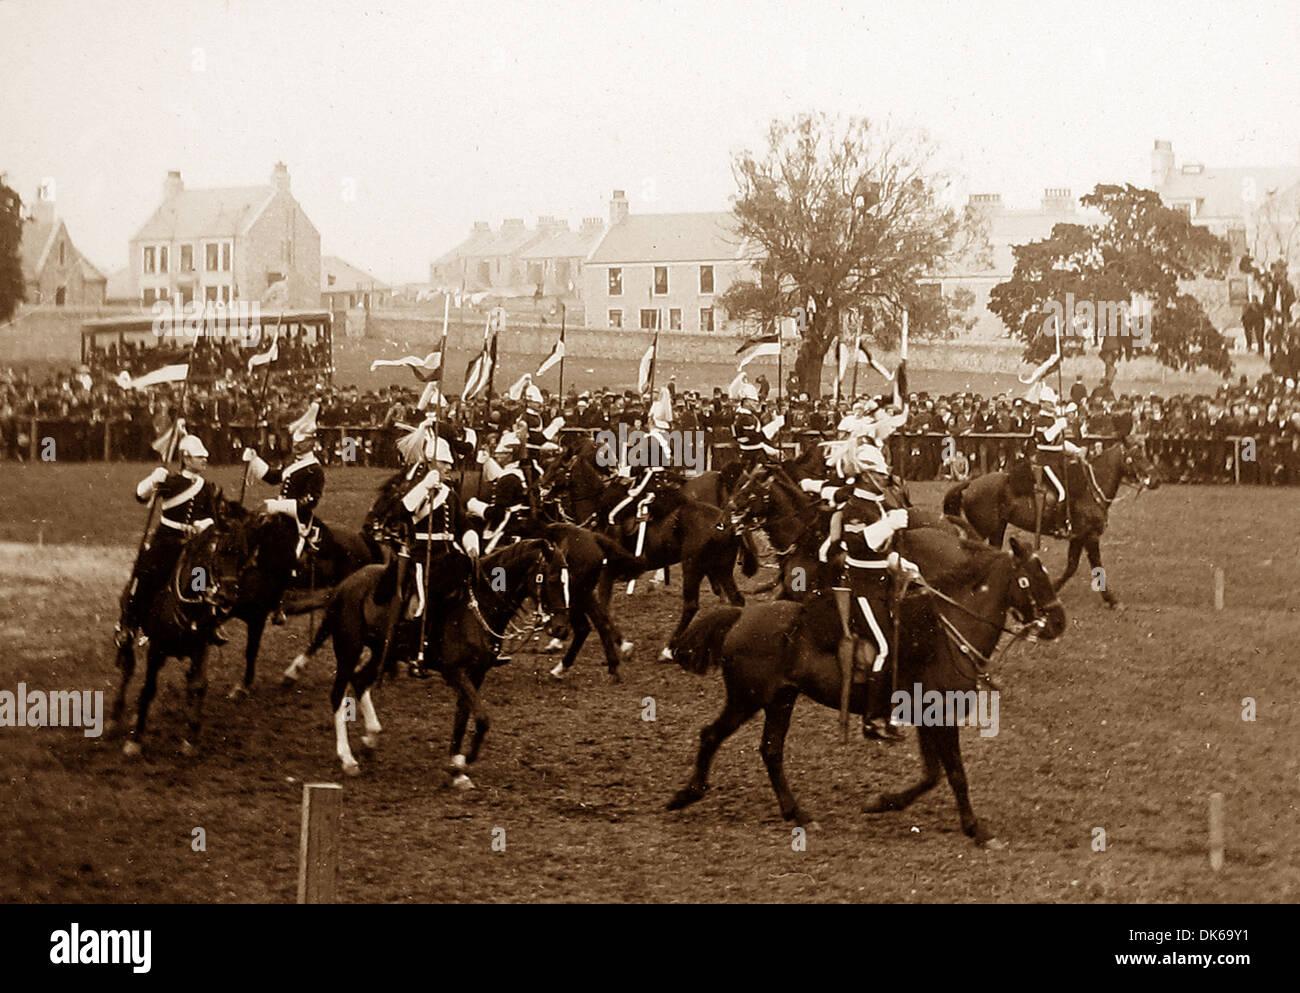 Cavalry Regiment Musical Ride in 1892 - Stock Image